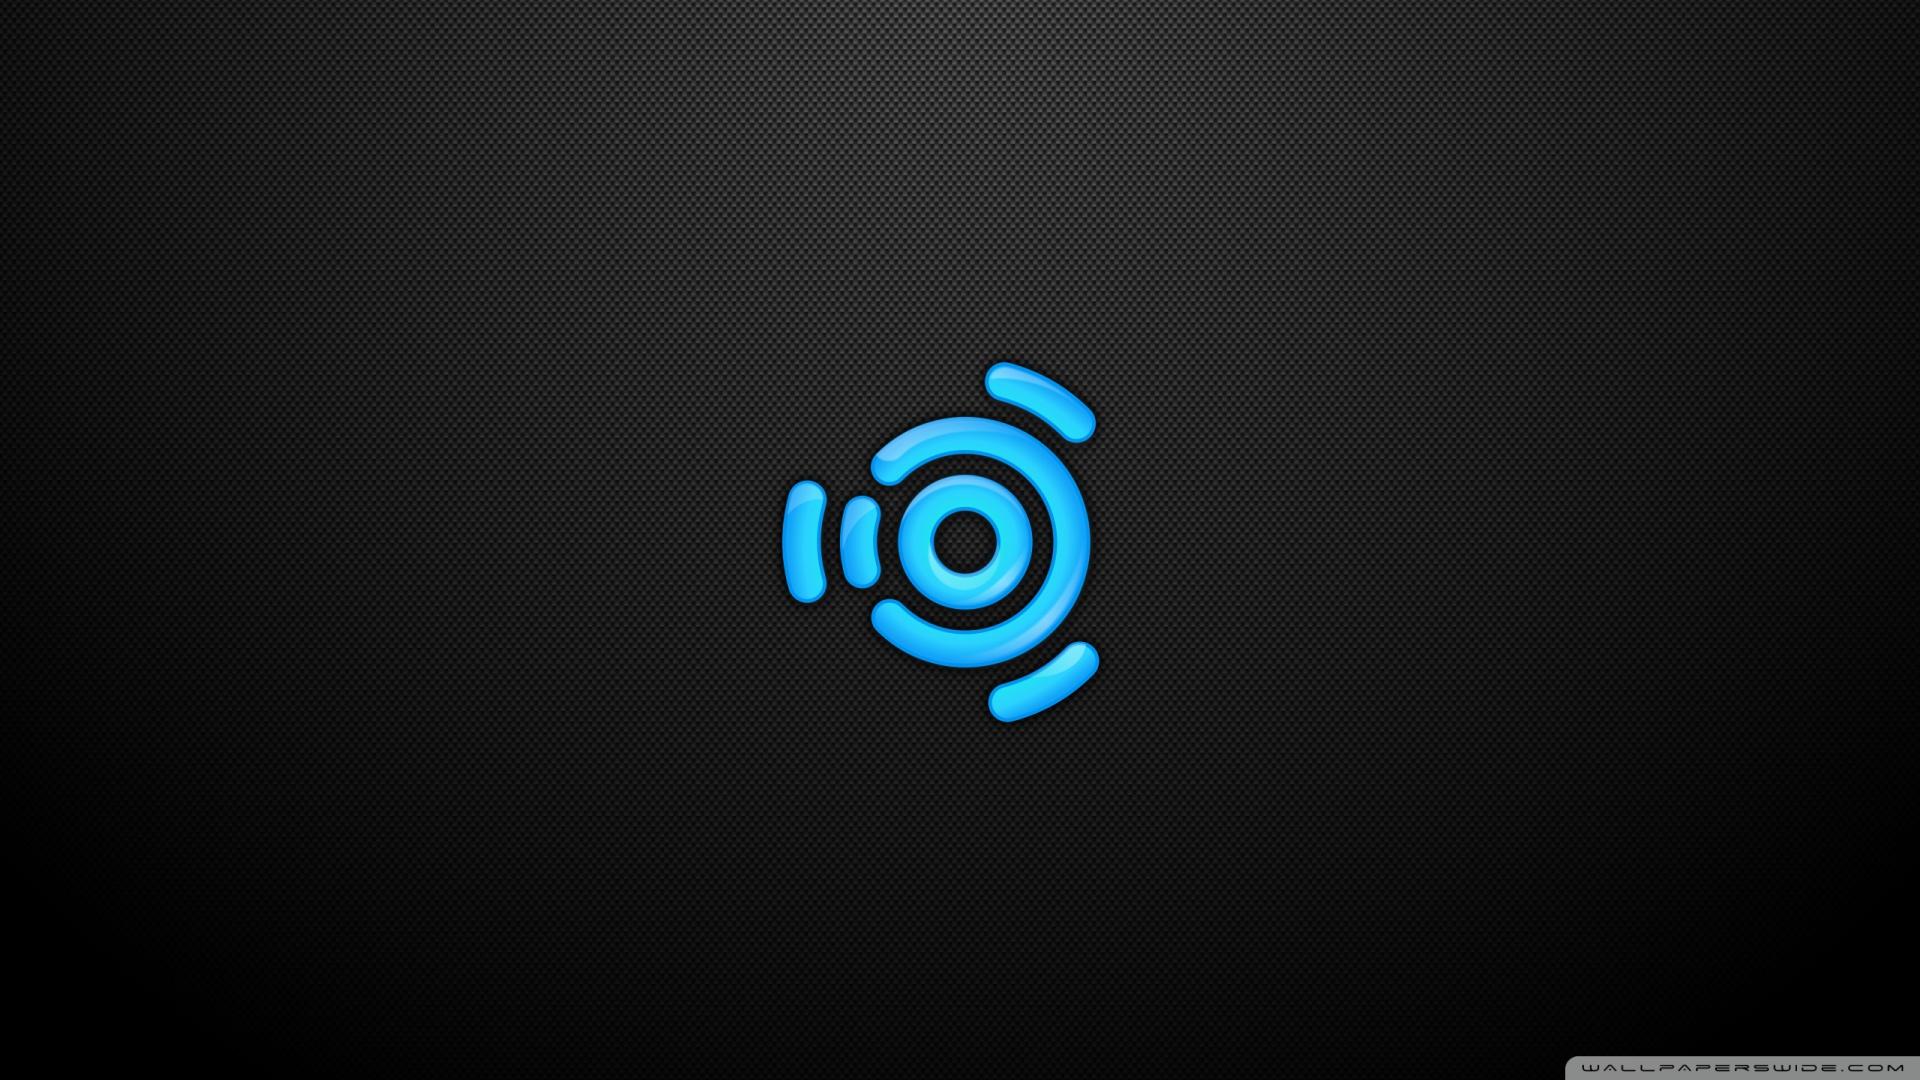 ubuntu wallpaper carbon images 1920x1080 1920x1080